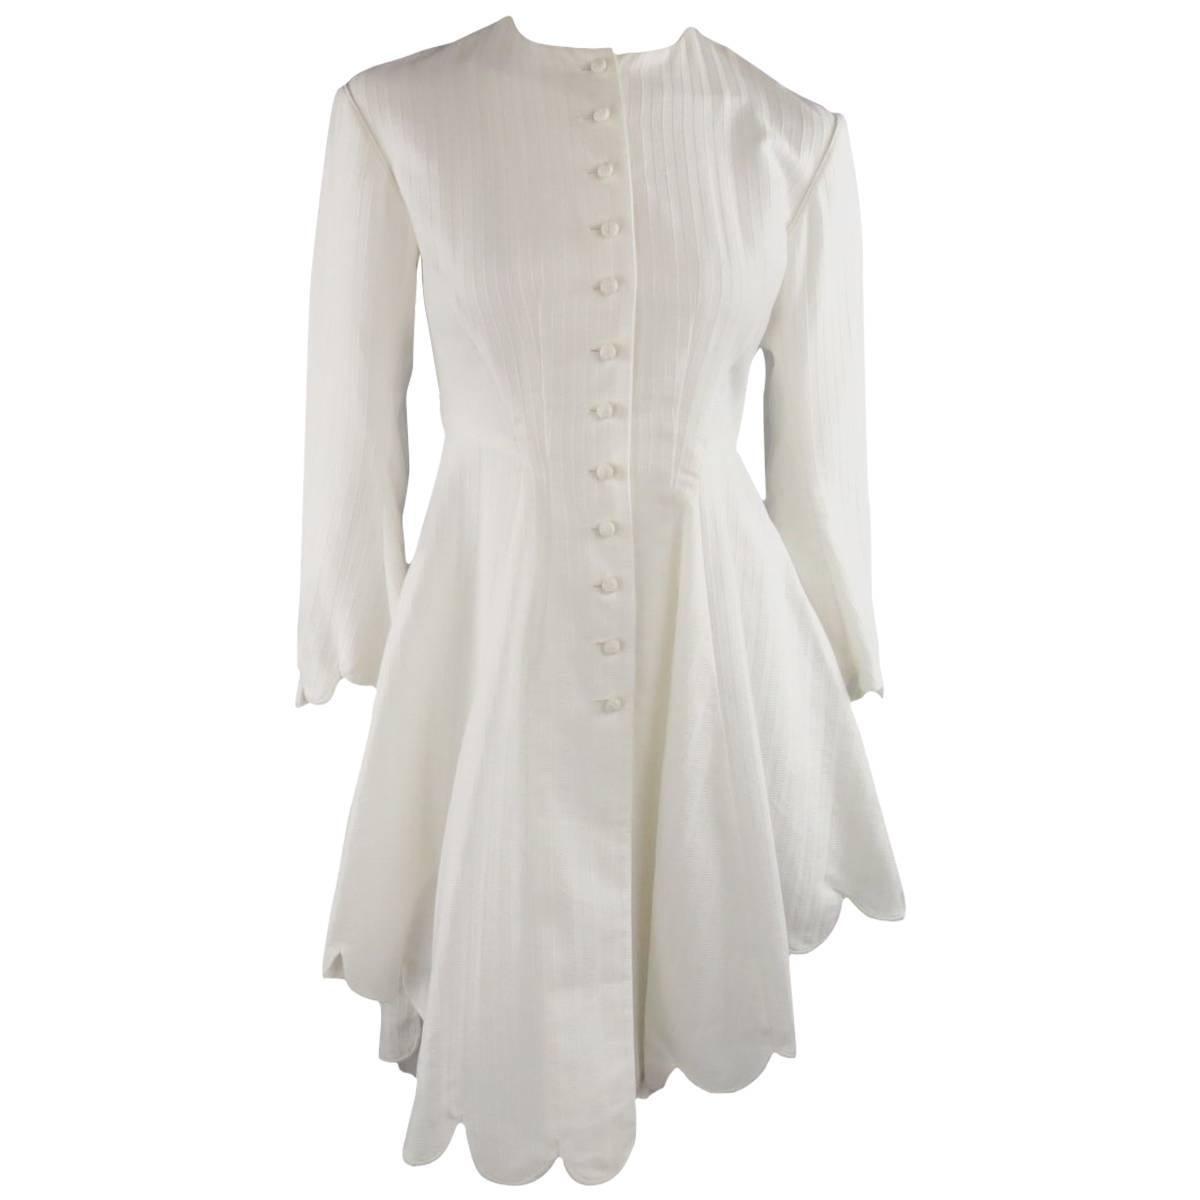 Ralph Lauren White Striped Cotton Scalloped High Low Shirt Dress At